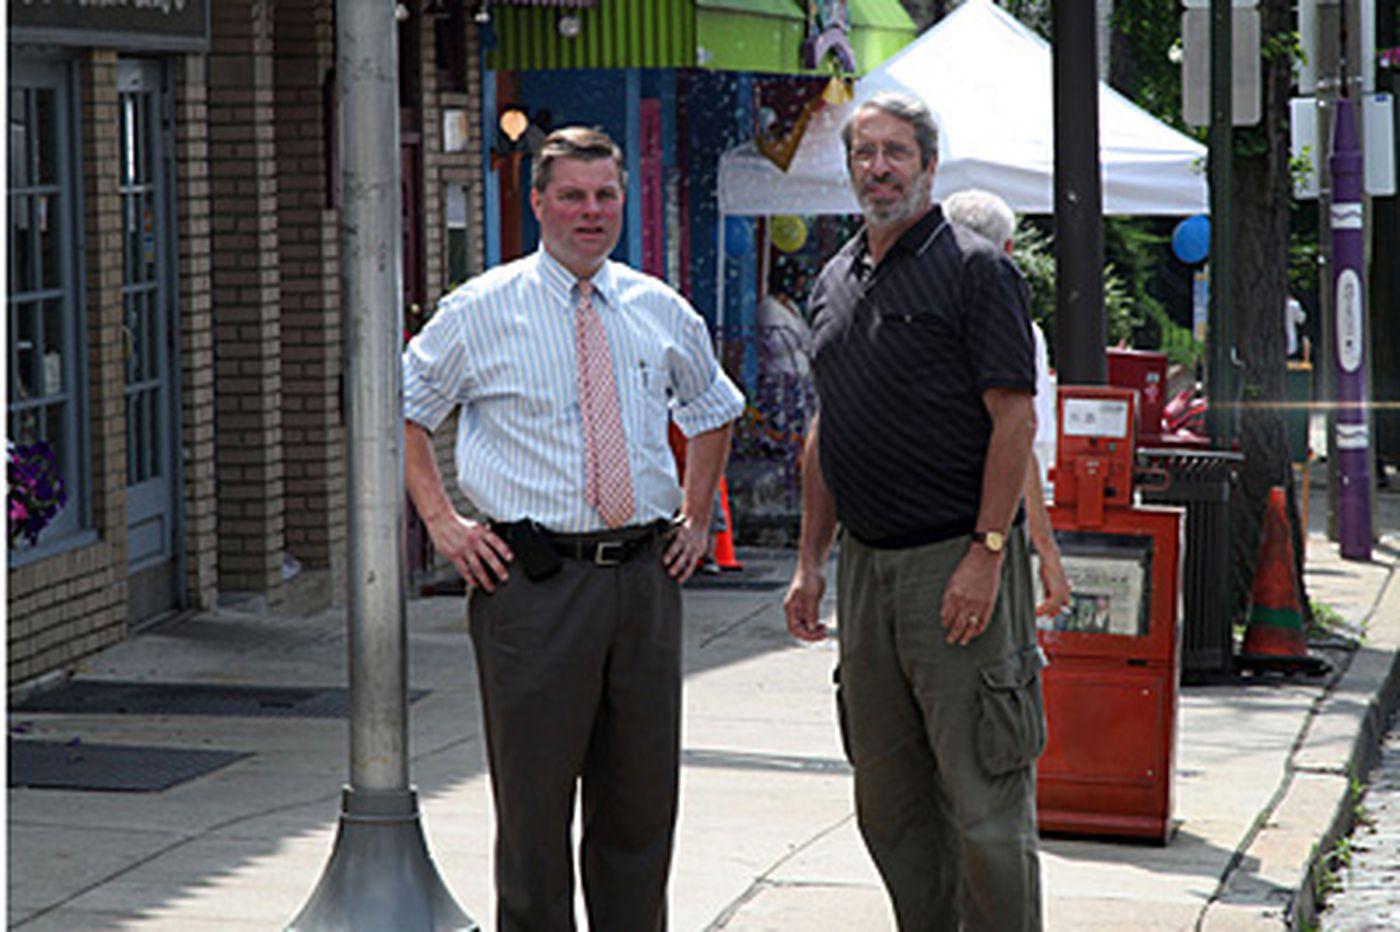 Chestnut Hill business strives to survive downturn